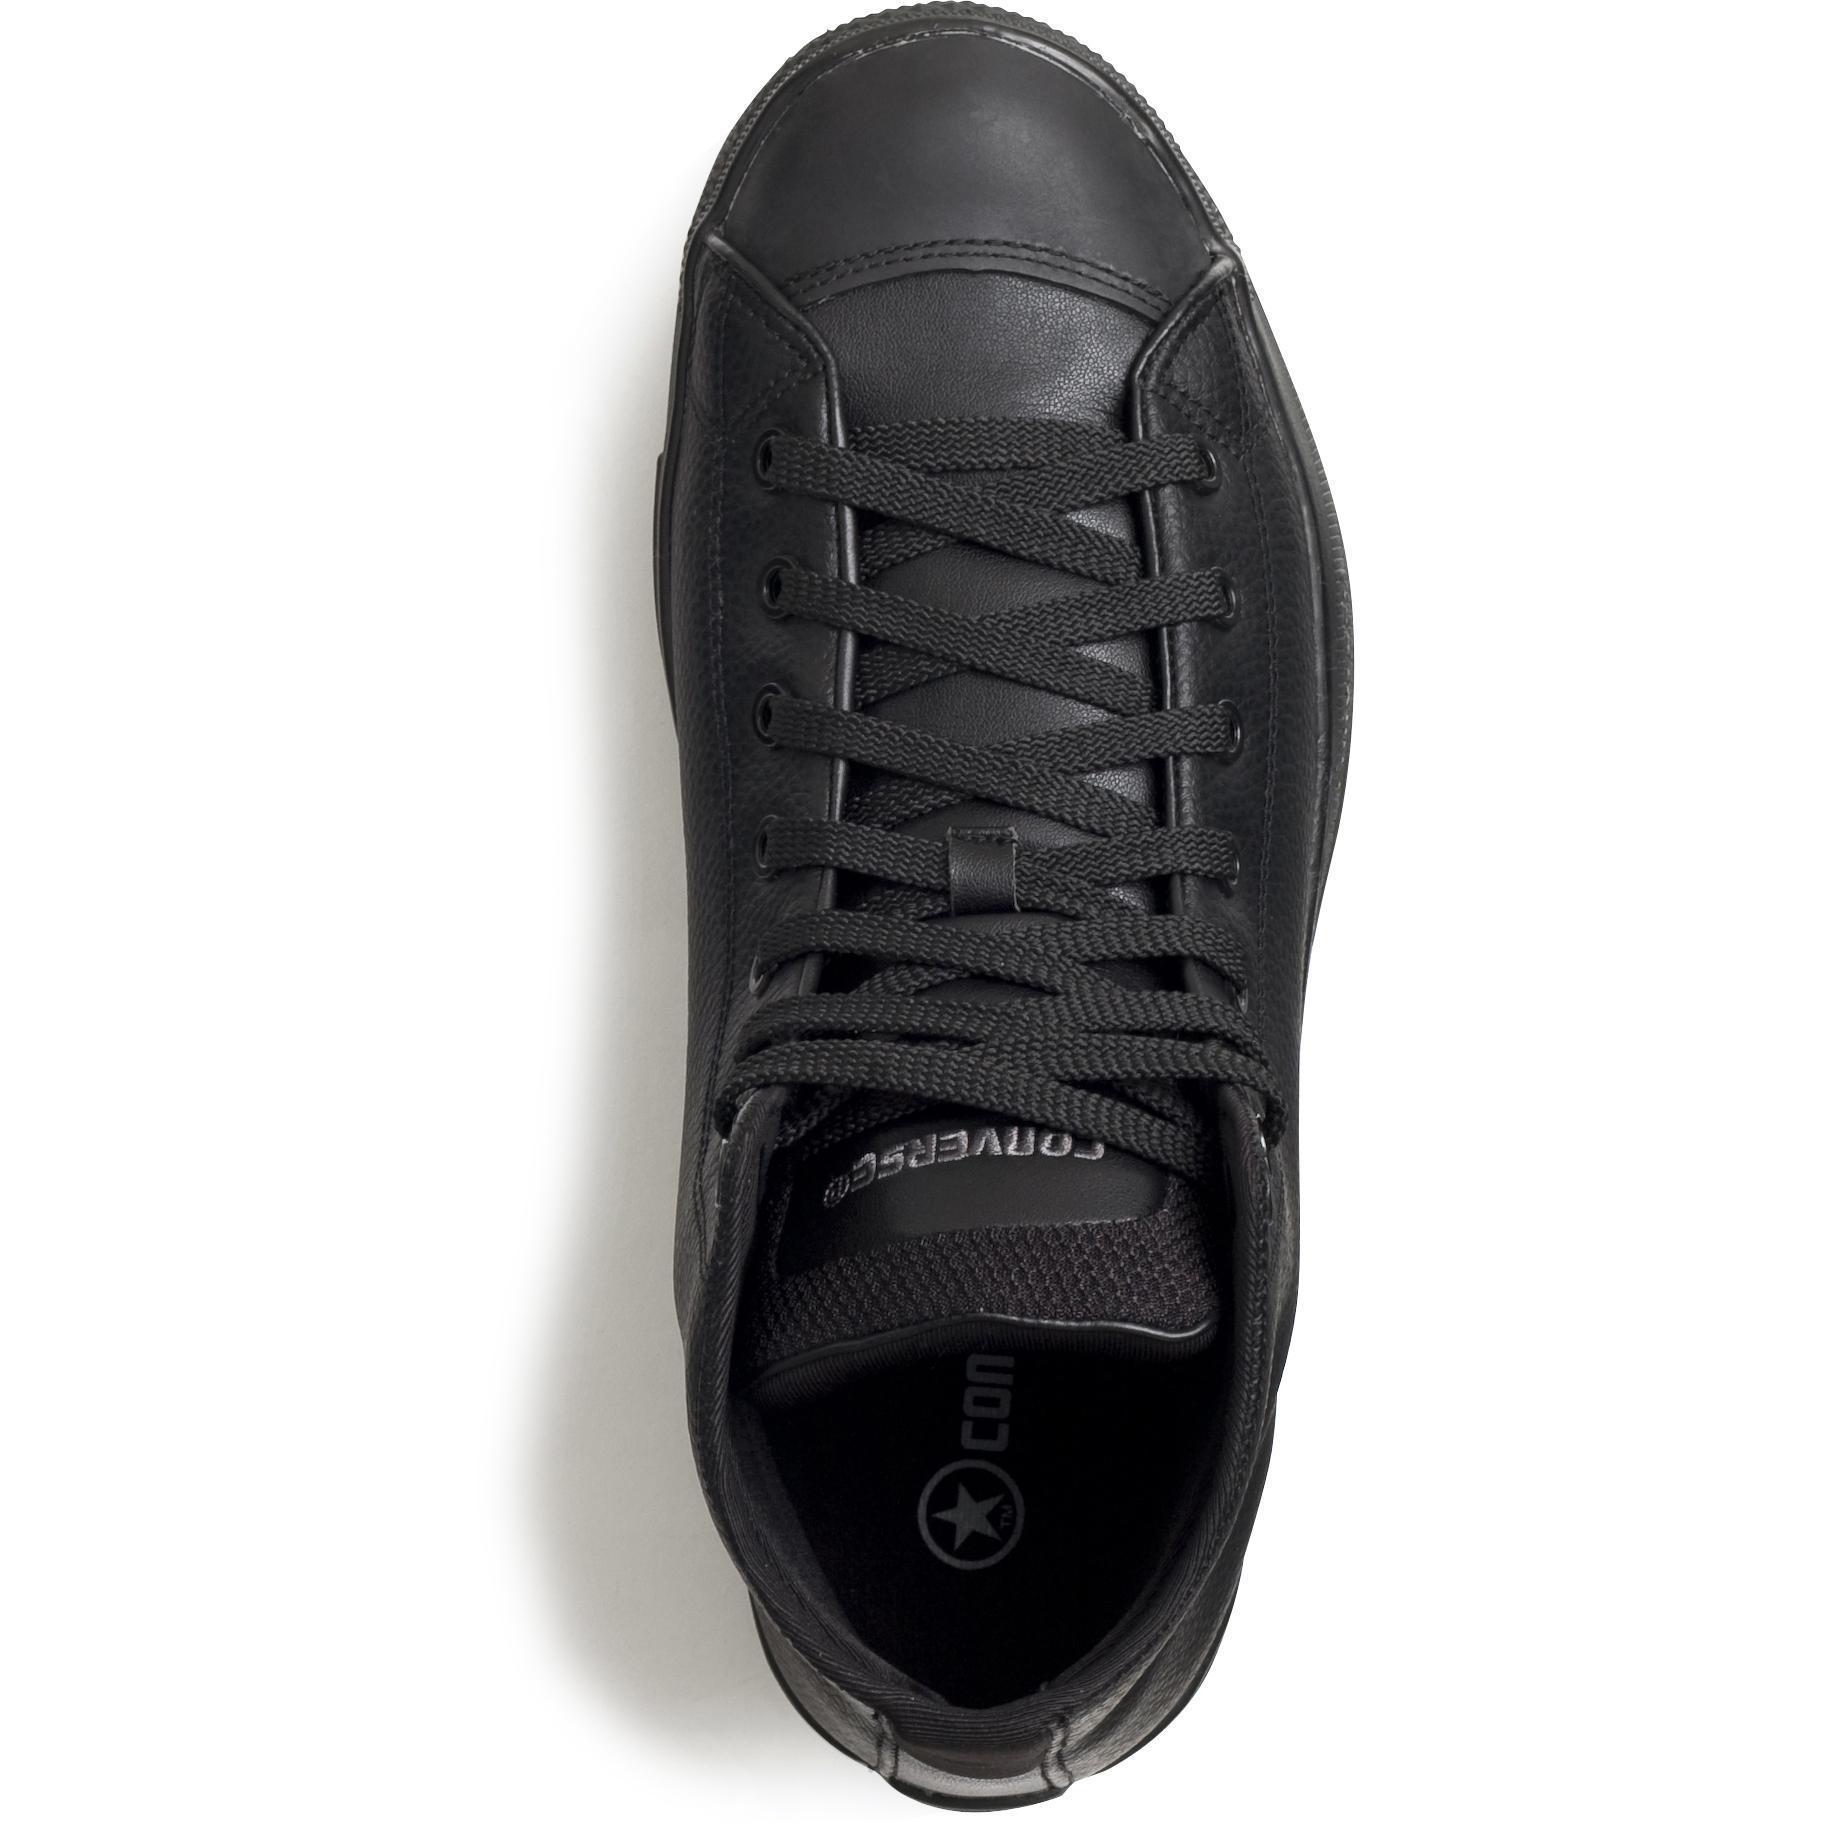 Converse Slip Resistant Hi Top - Lehigh Outfitters c885a7c0e